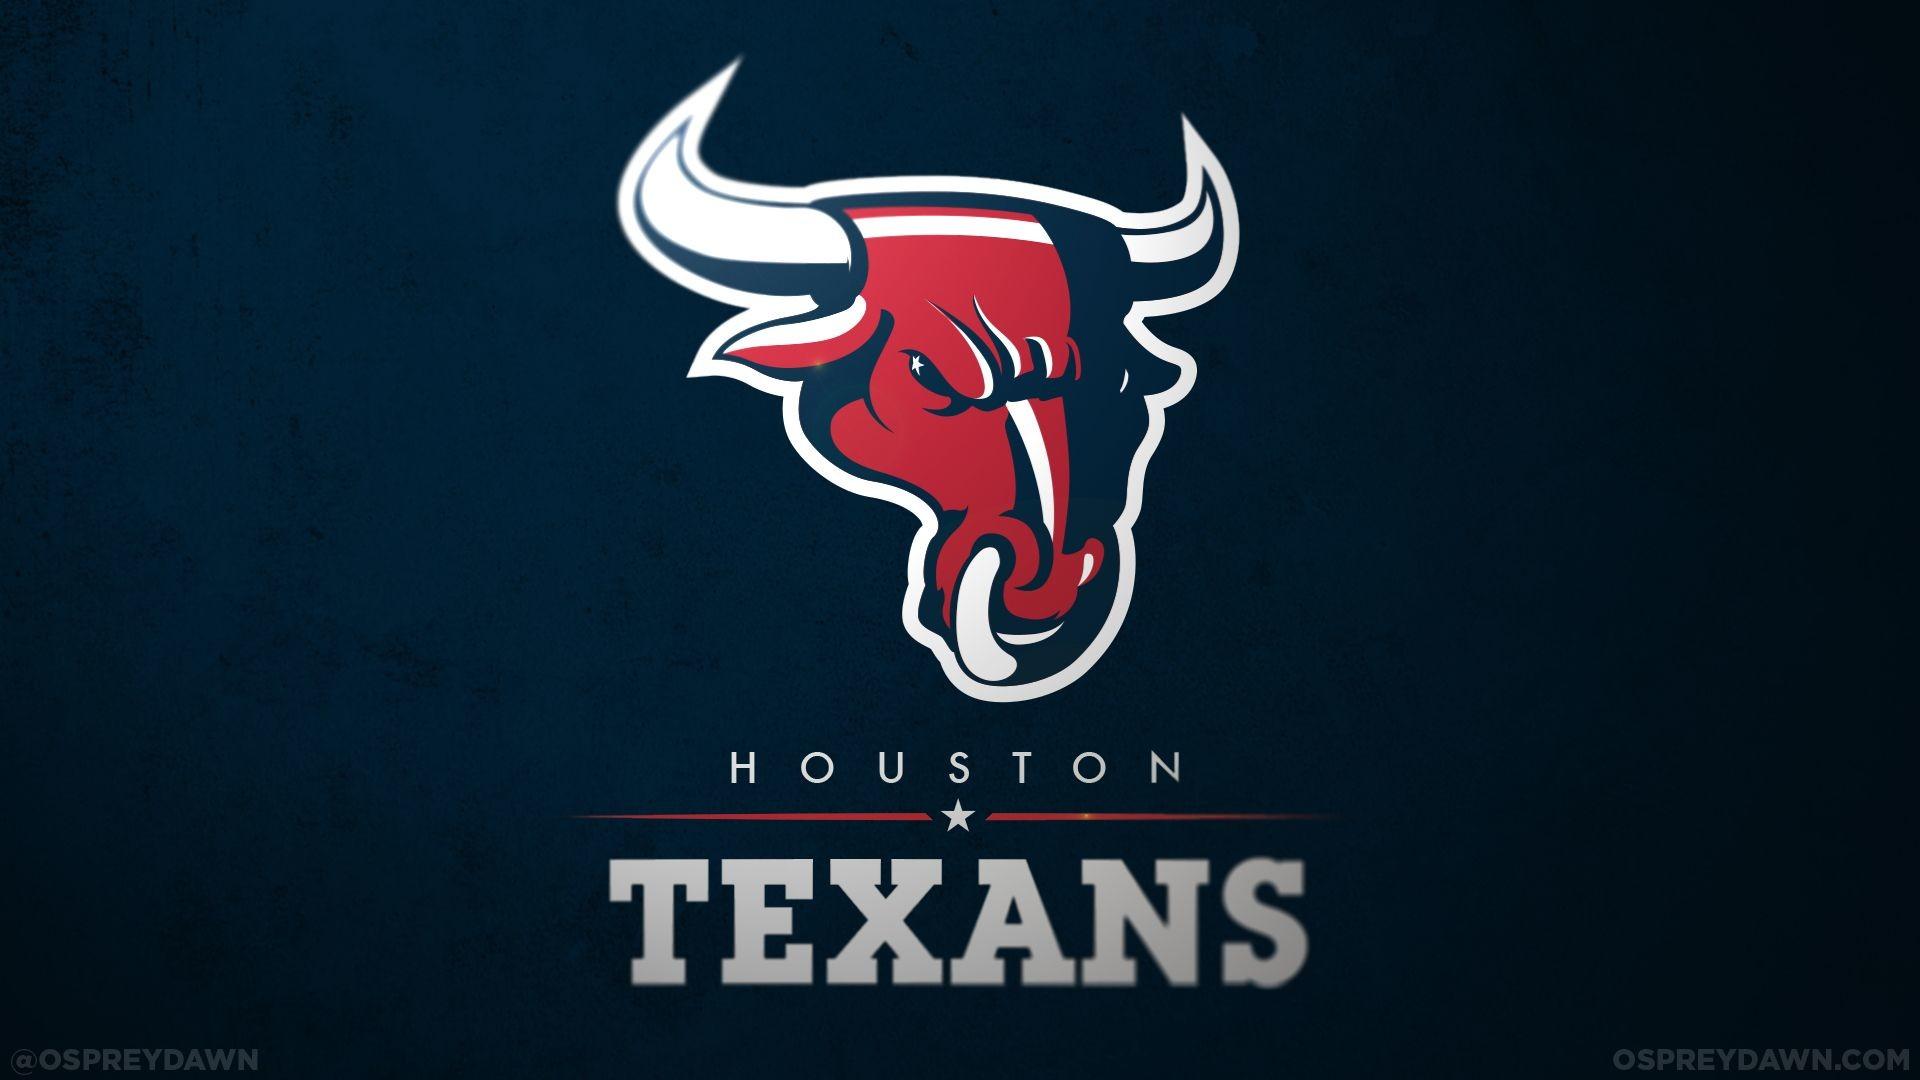 Houston Texans Wallpapers HD